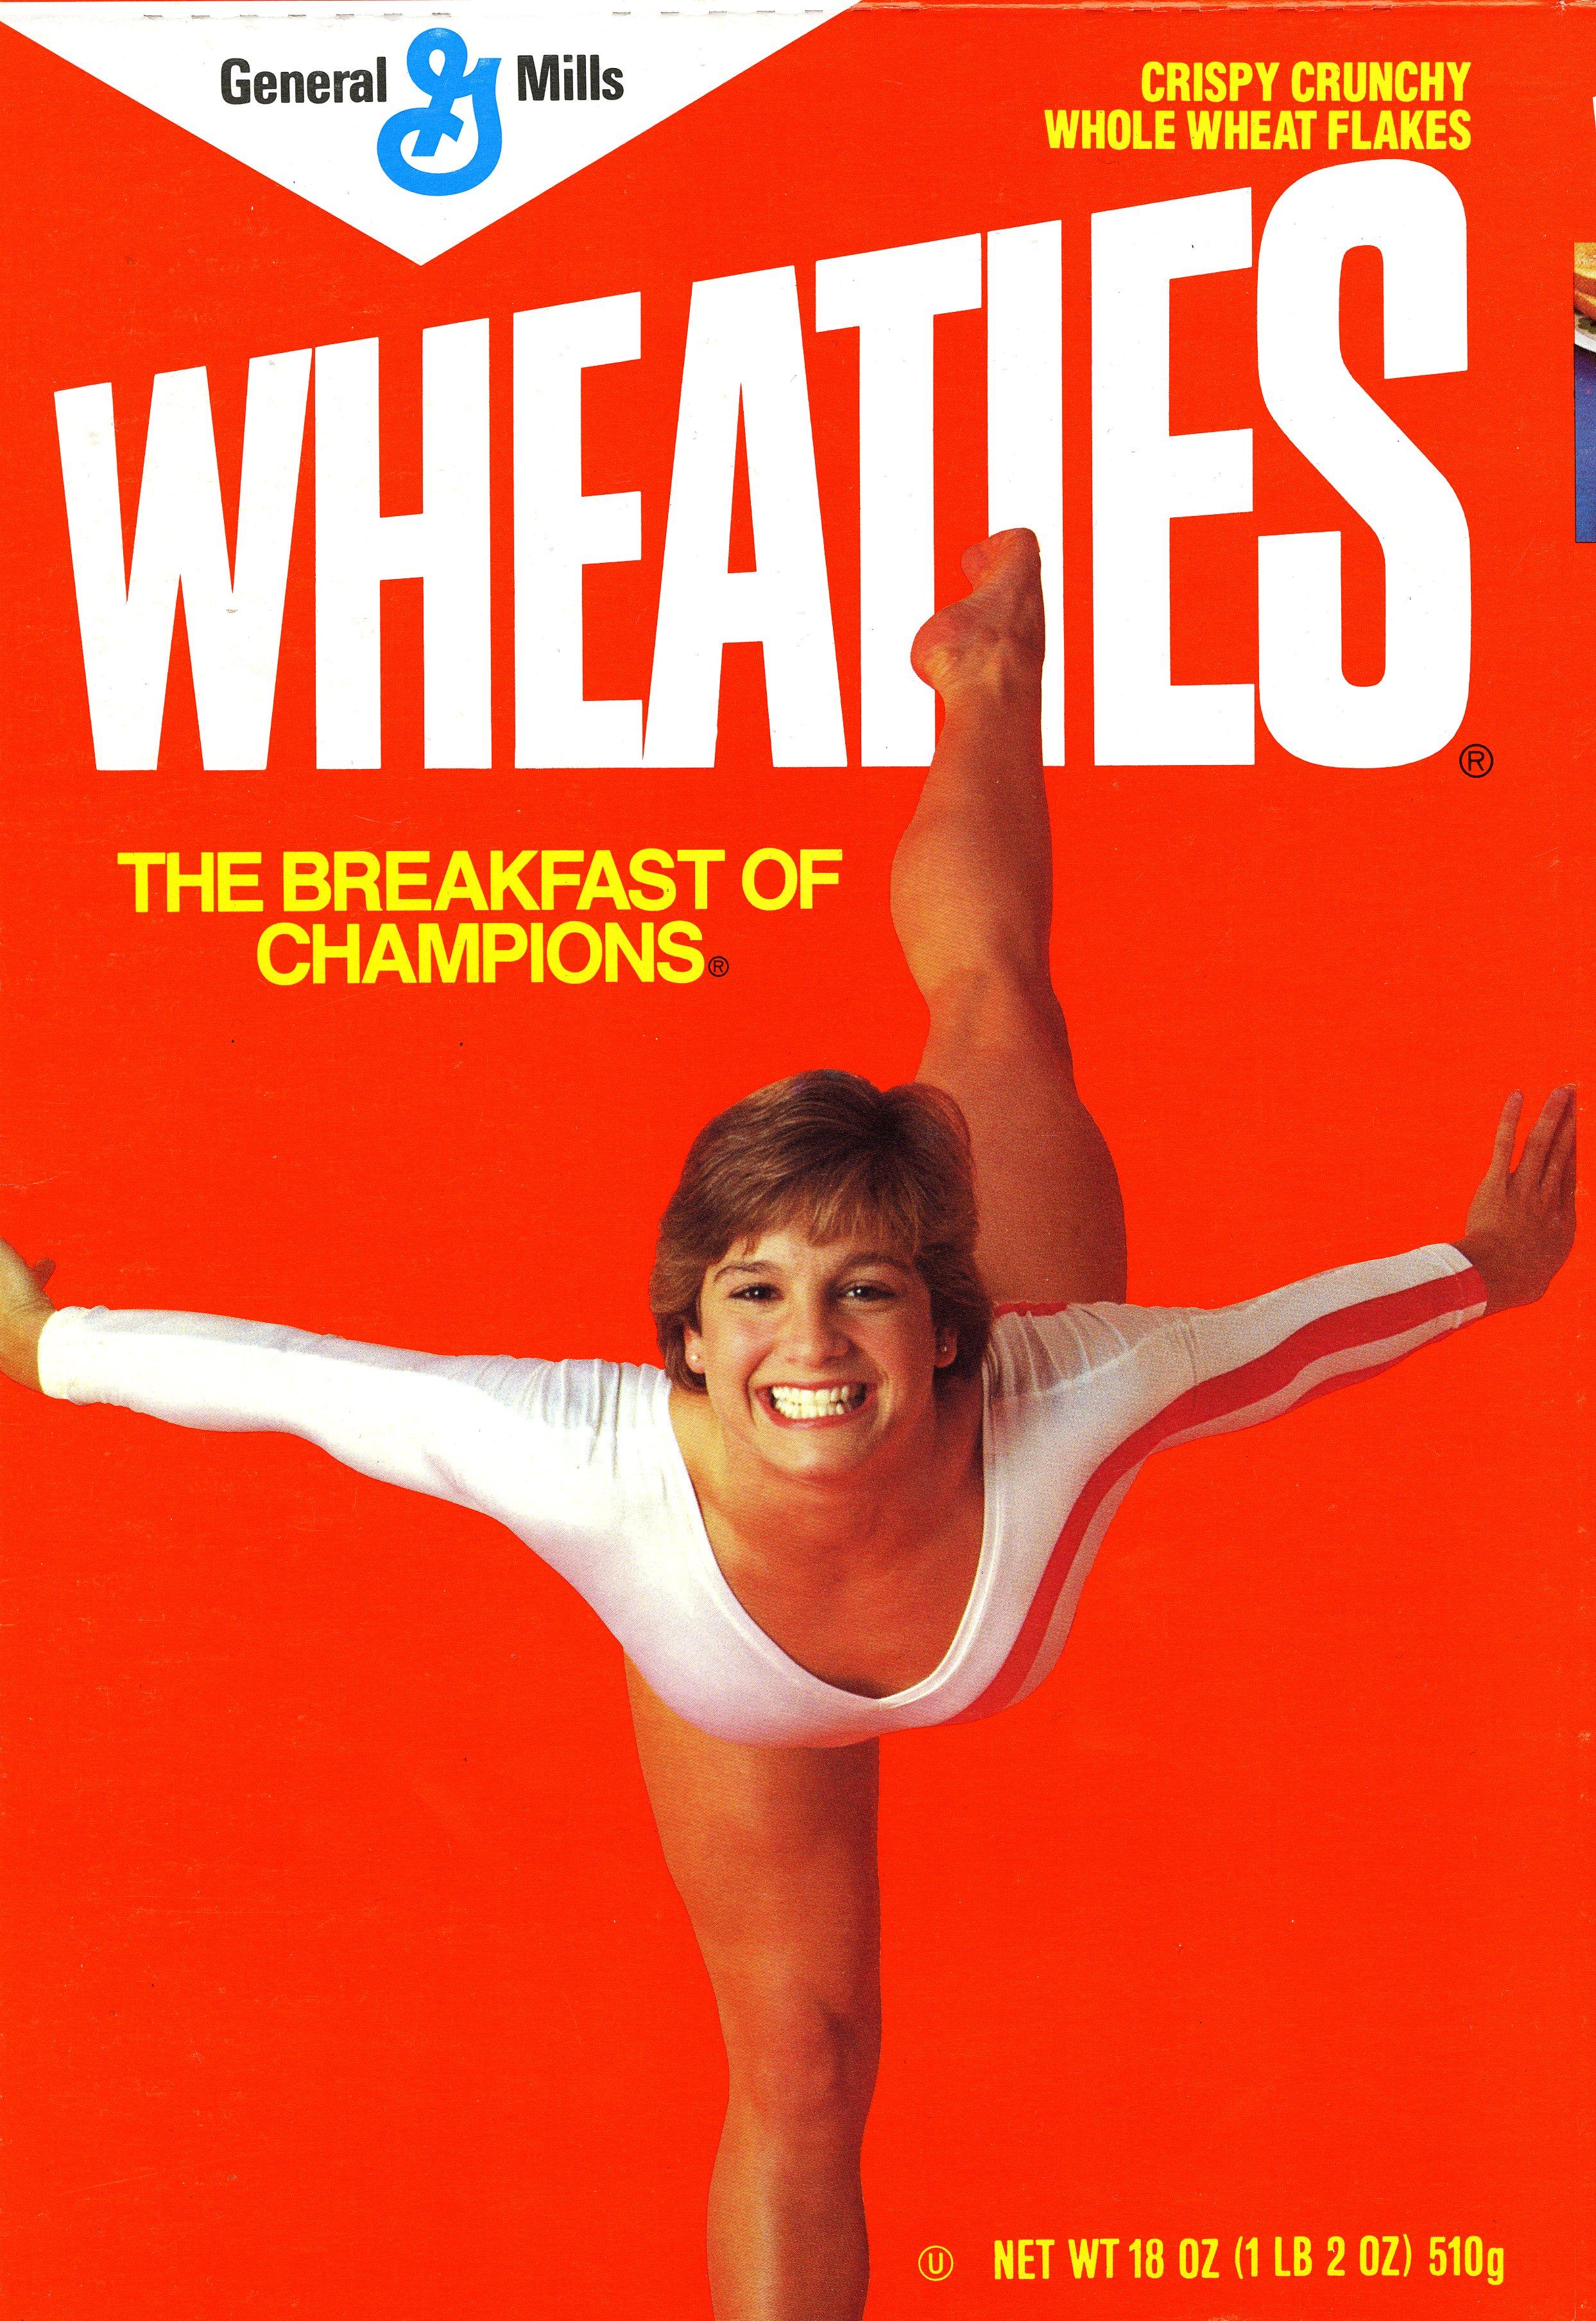 Mary Lou Retton on the Wheaties box.